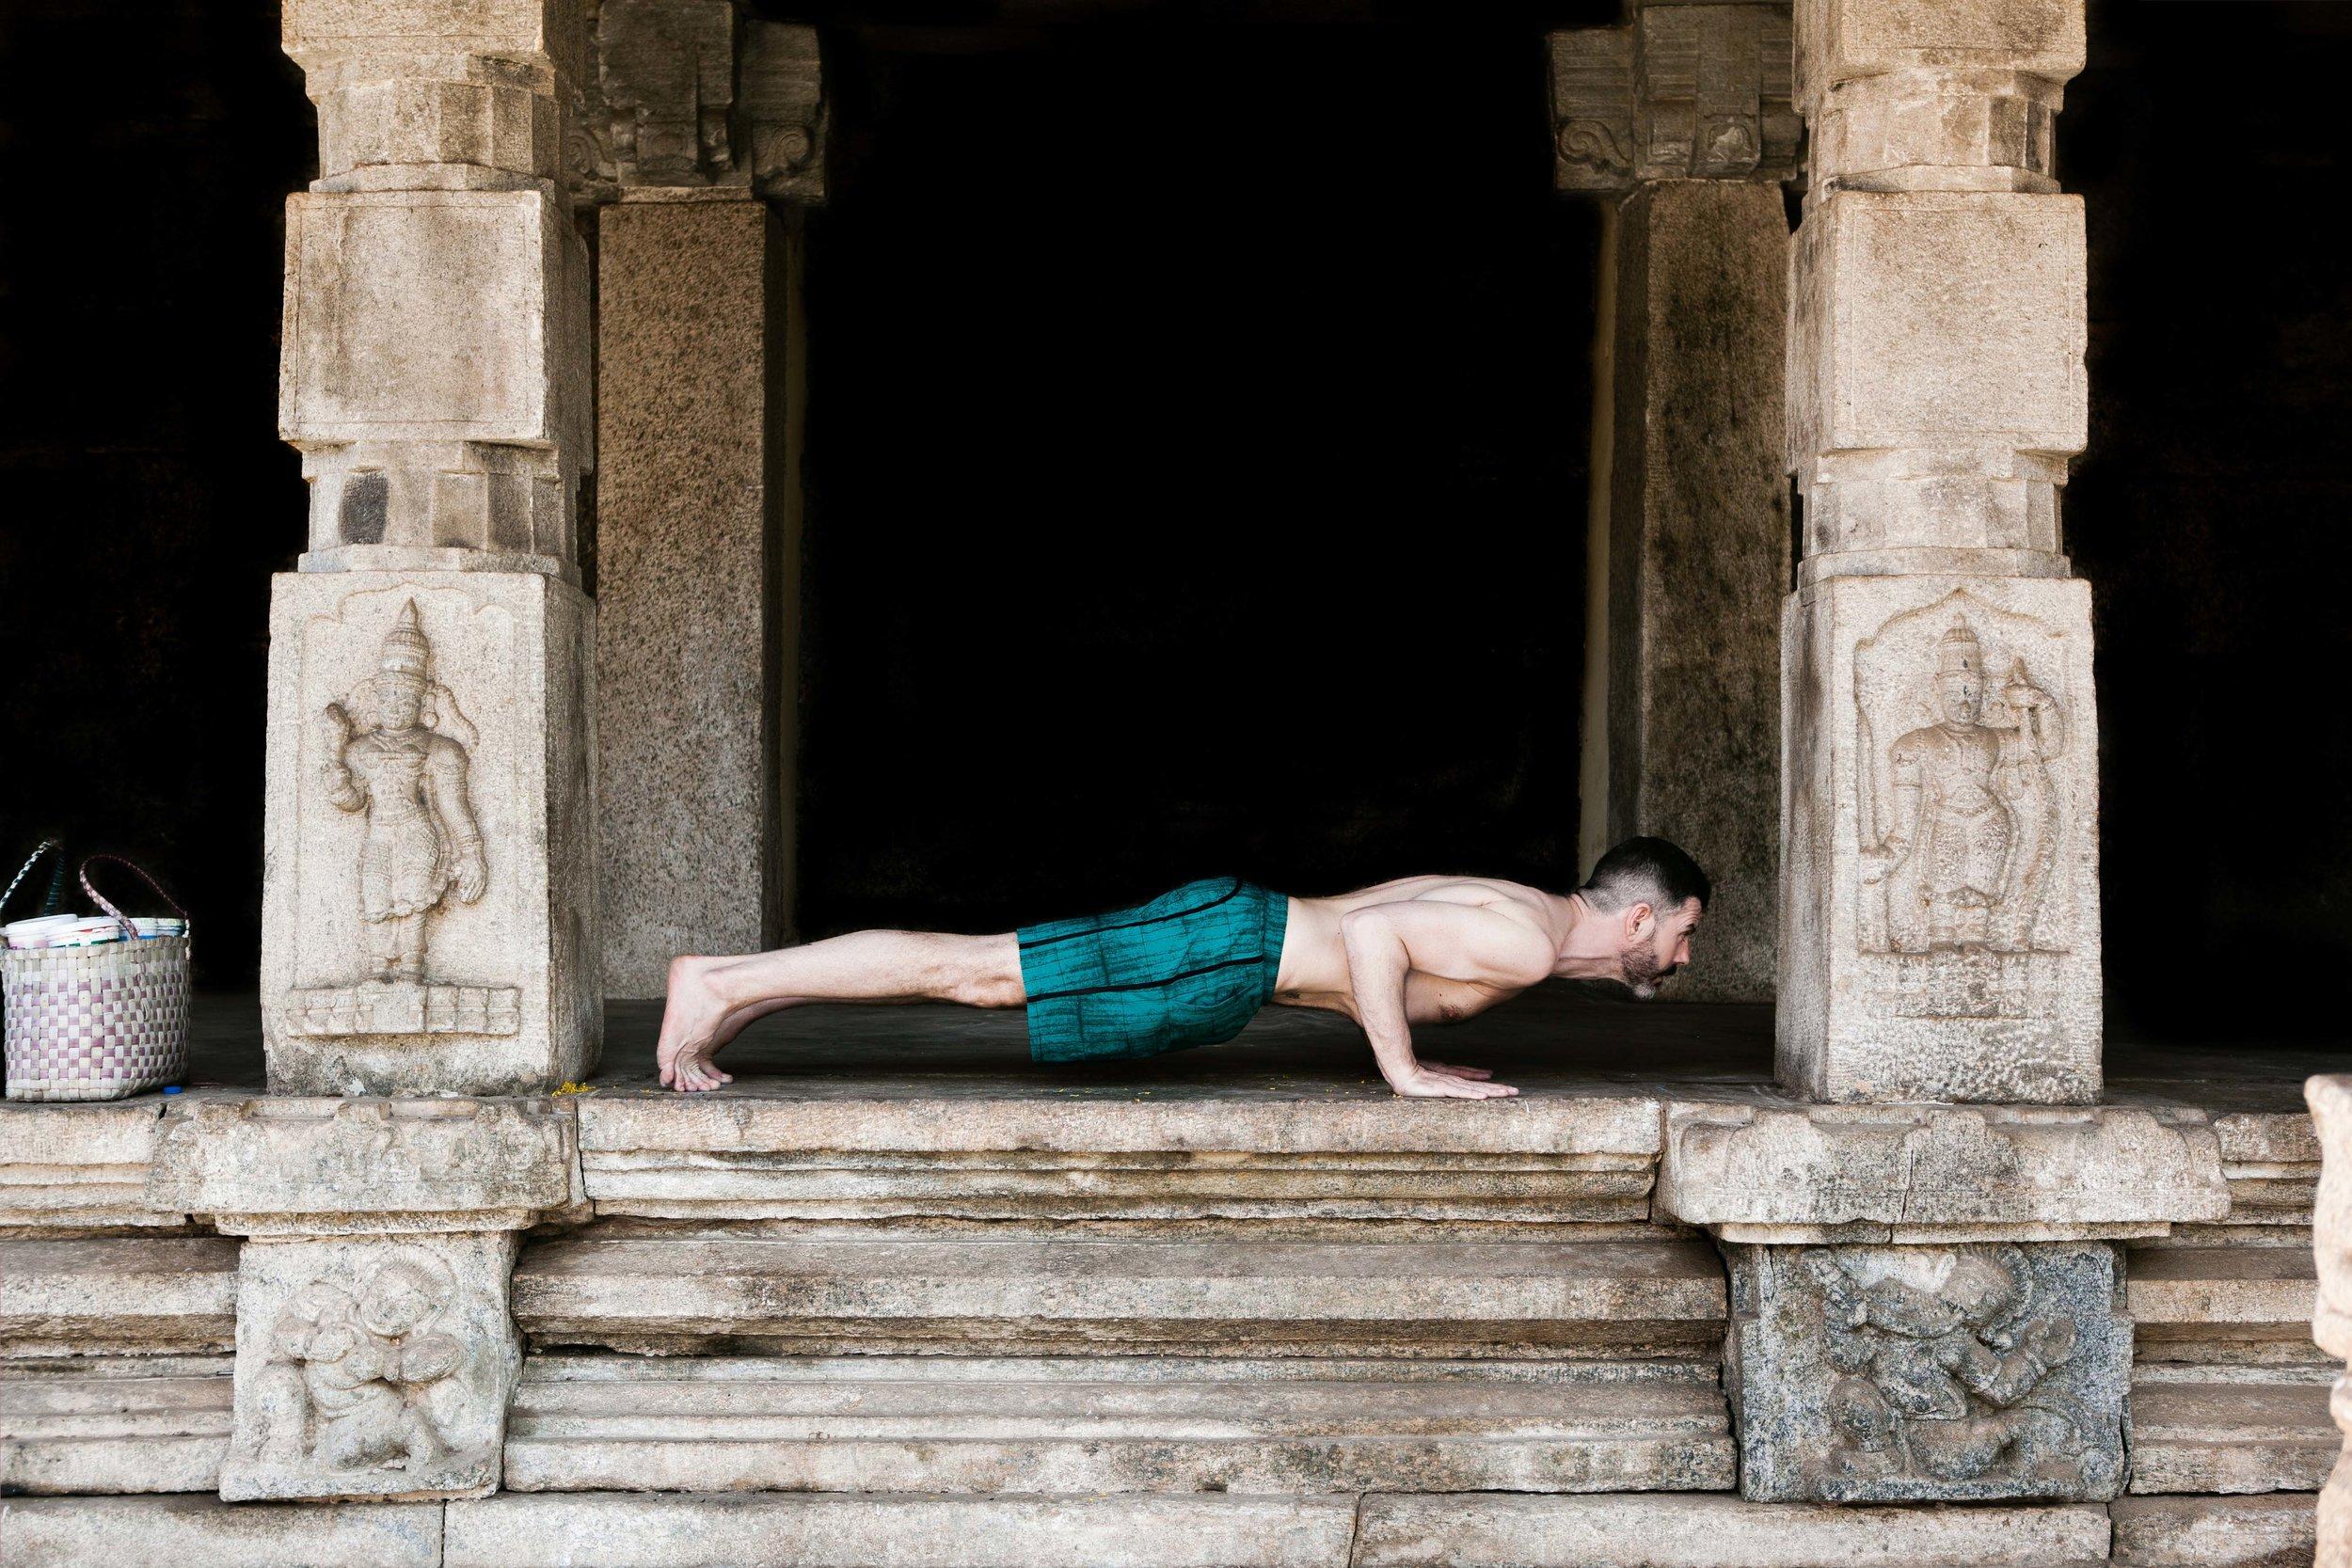 Alessandro_cioffari_bertalli_ashtanga_yoga_varese_mirta_kojali_india_15.jpg